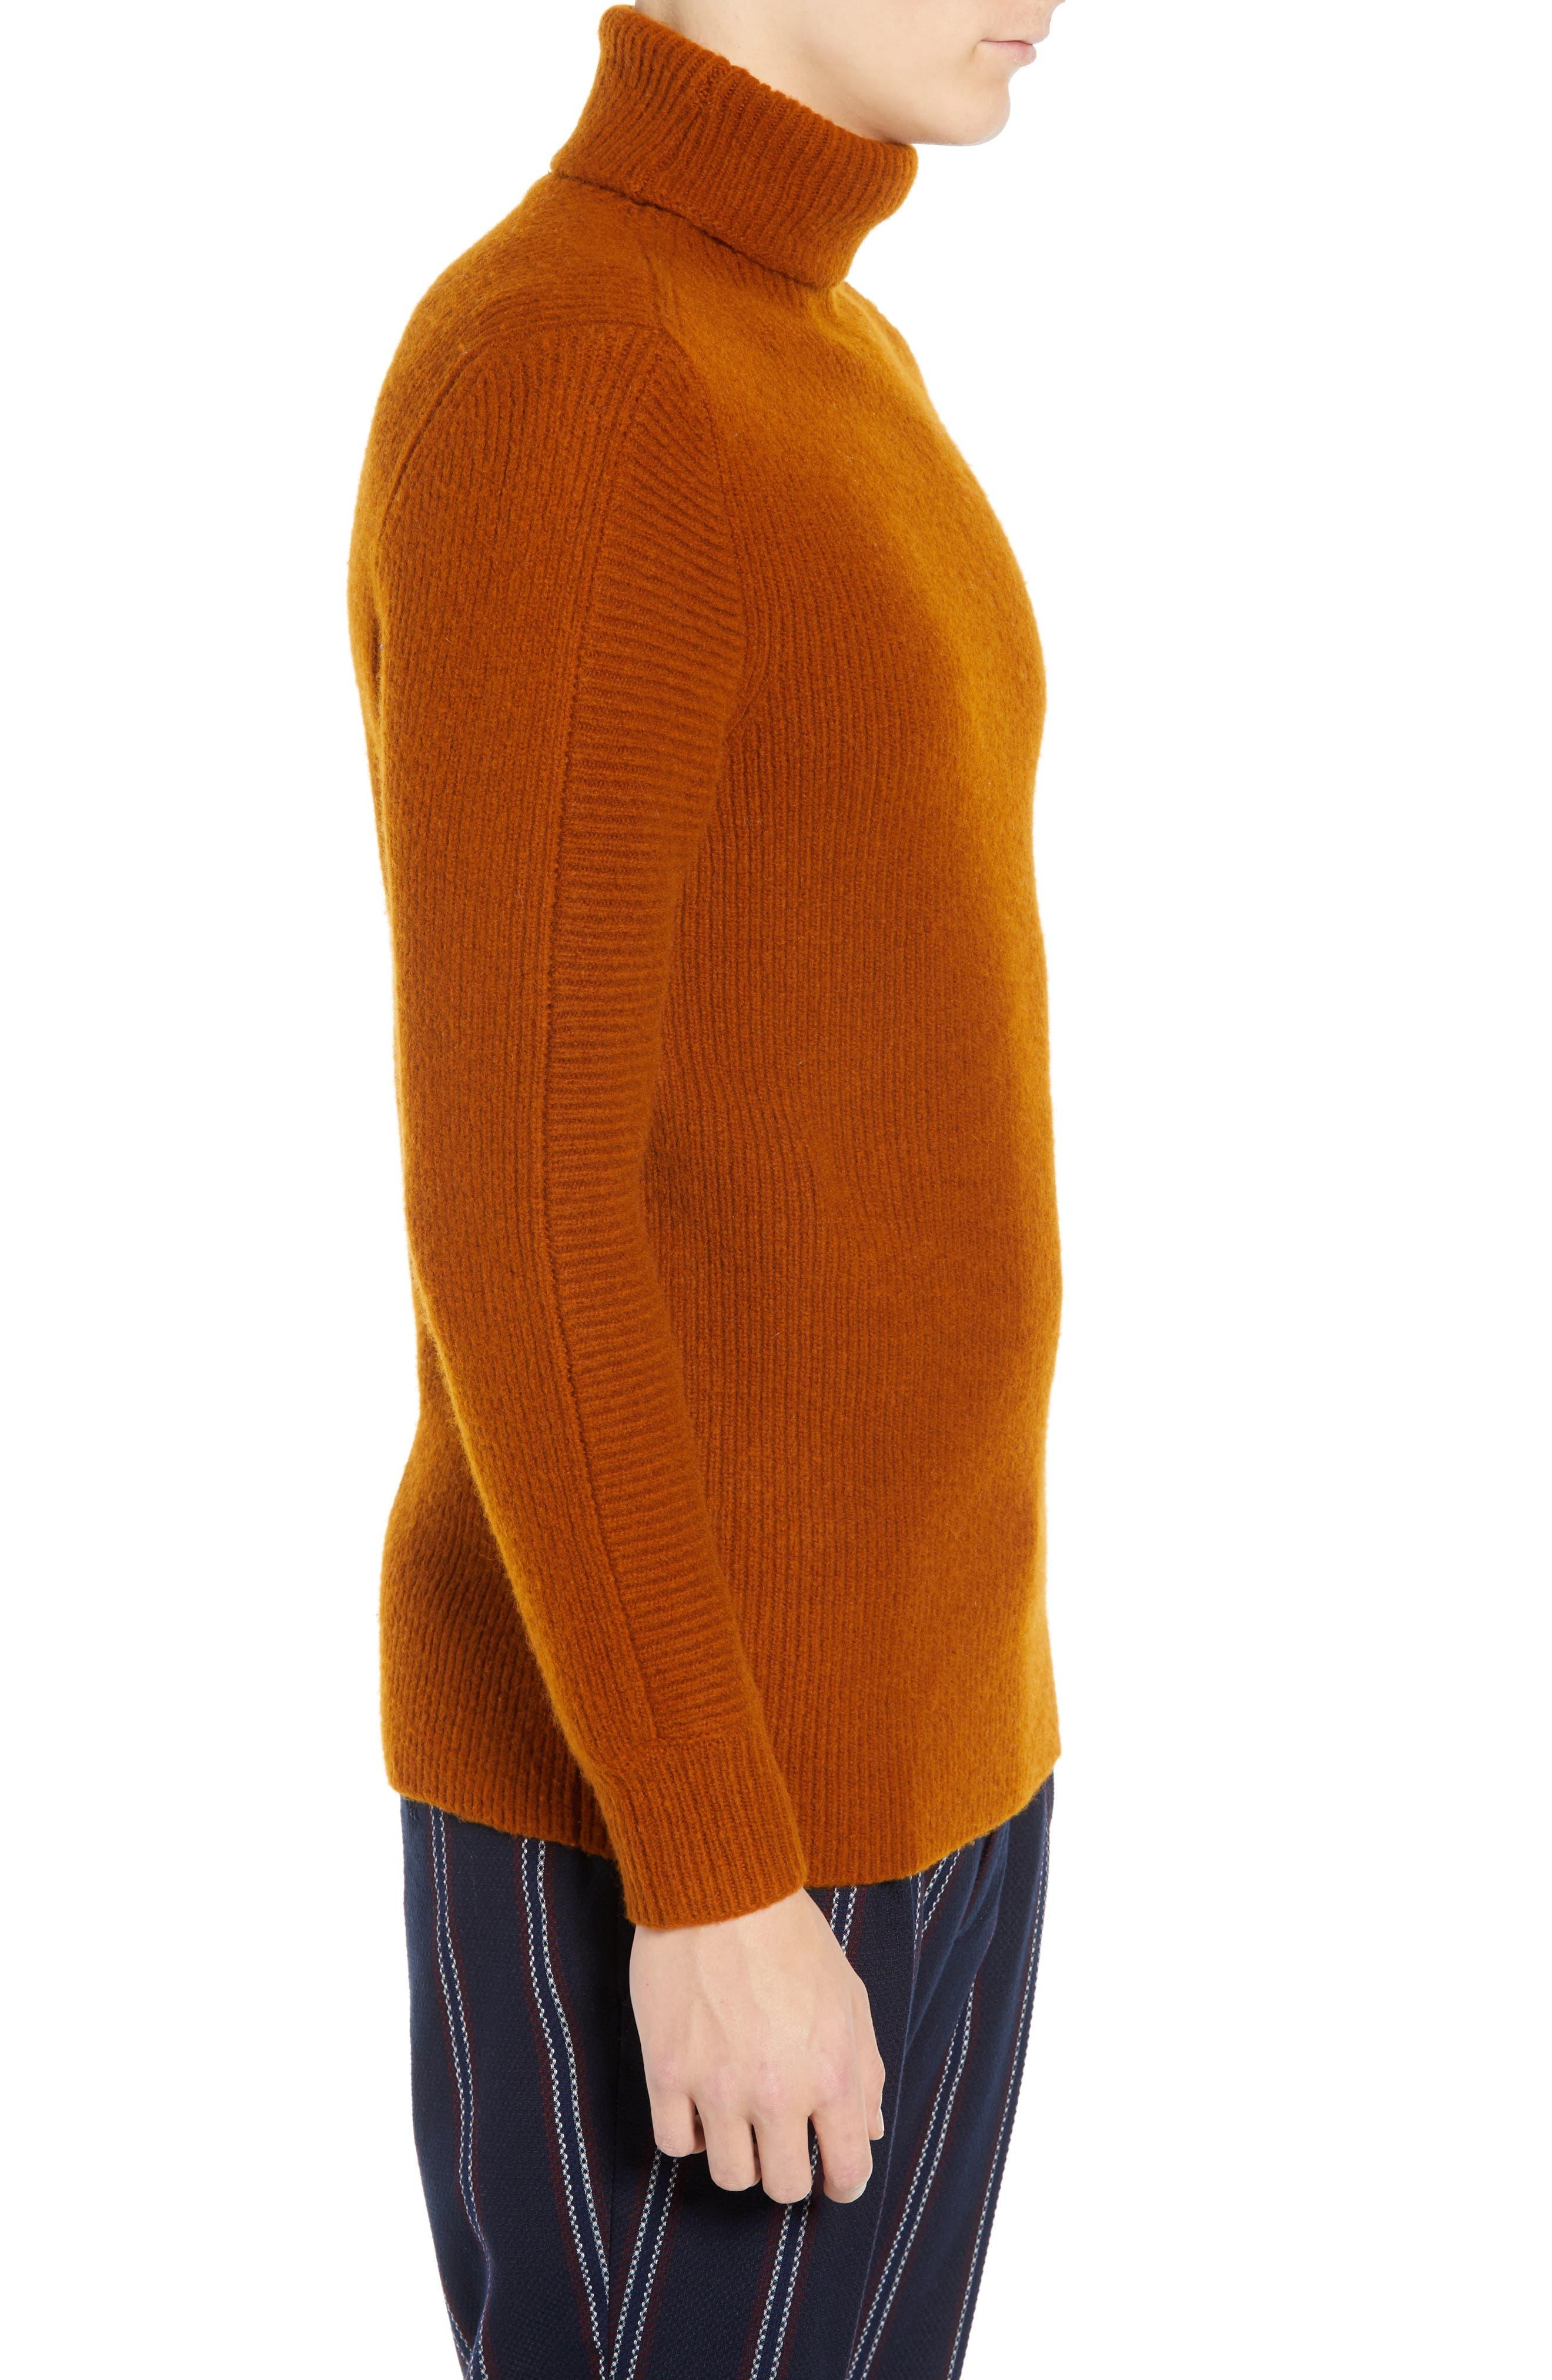 Wool Blend Turtleneck Sweater,                             Alternate thumbnail 3, color,                             RUSSET BROWN